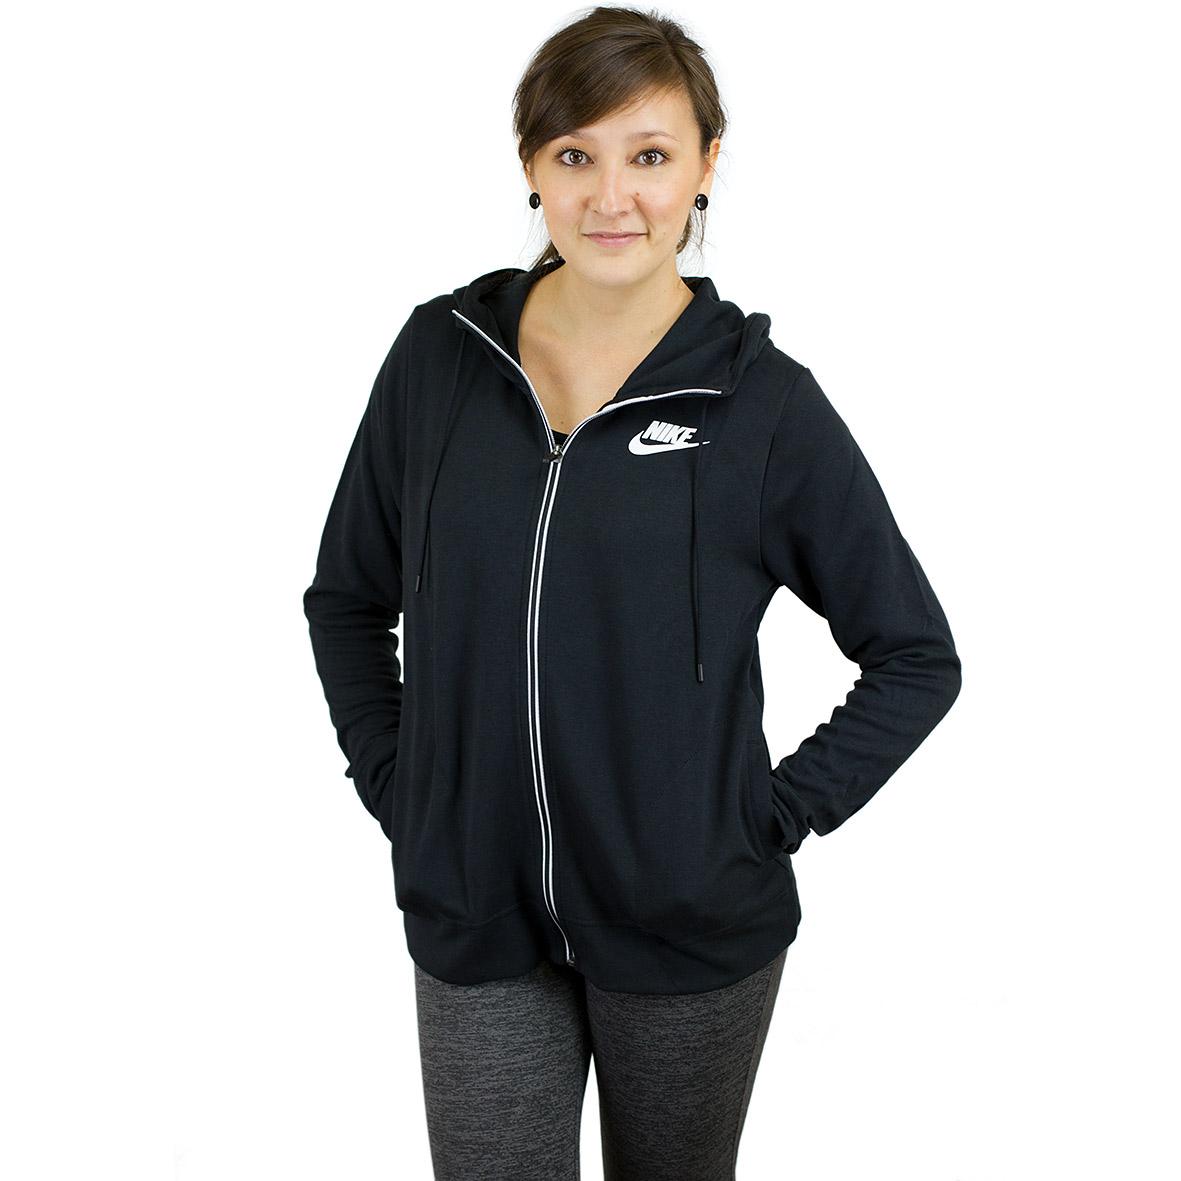 46c40edfaaed ☆ Nike Damen Zip-Hoody Advance 15 schwarz weiß - hier bestellen!